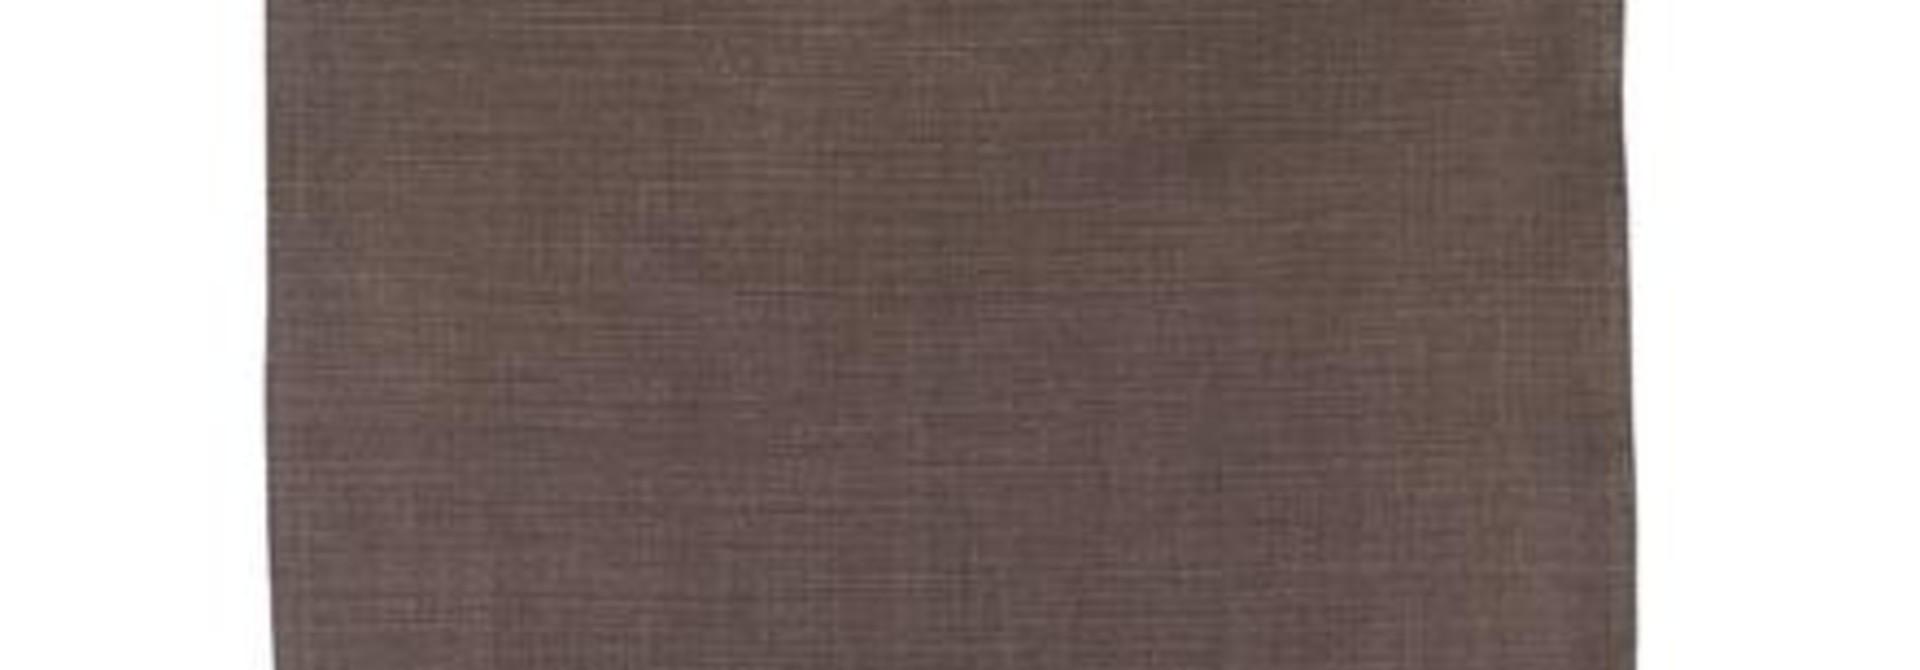 Tablecloth -Vence - Cafe Noir - Sz. Lge